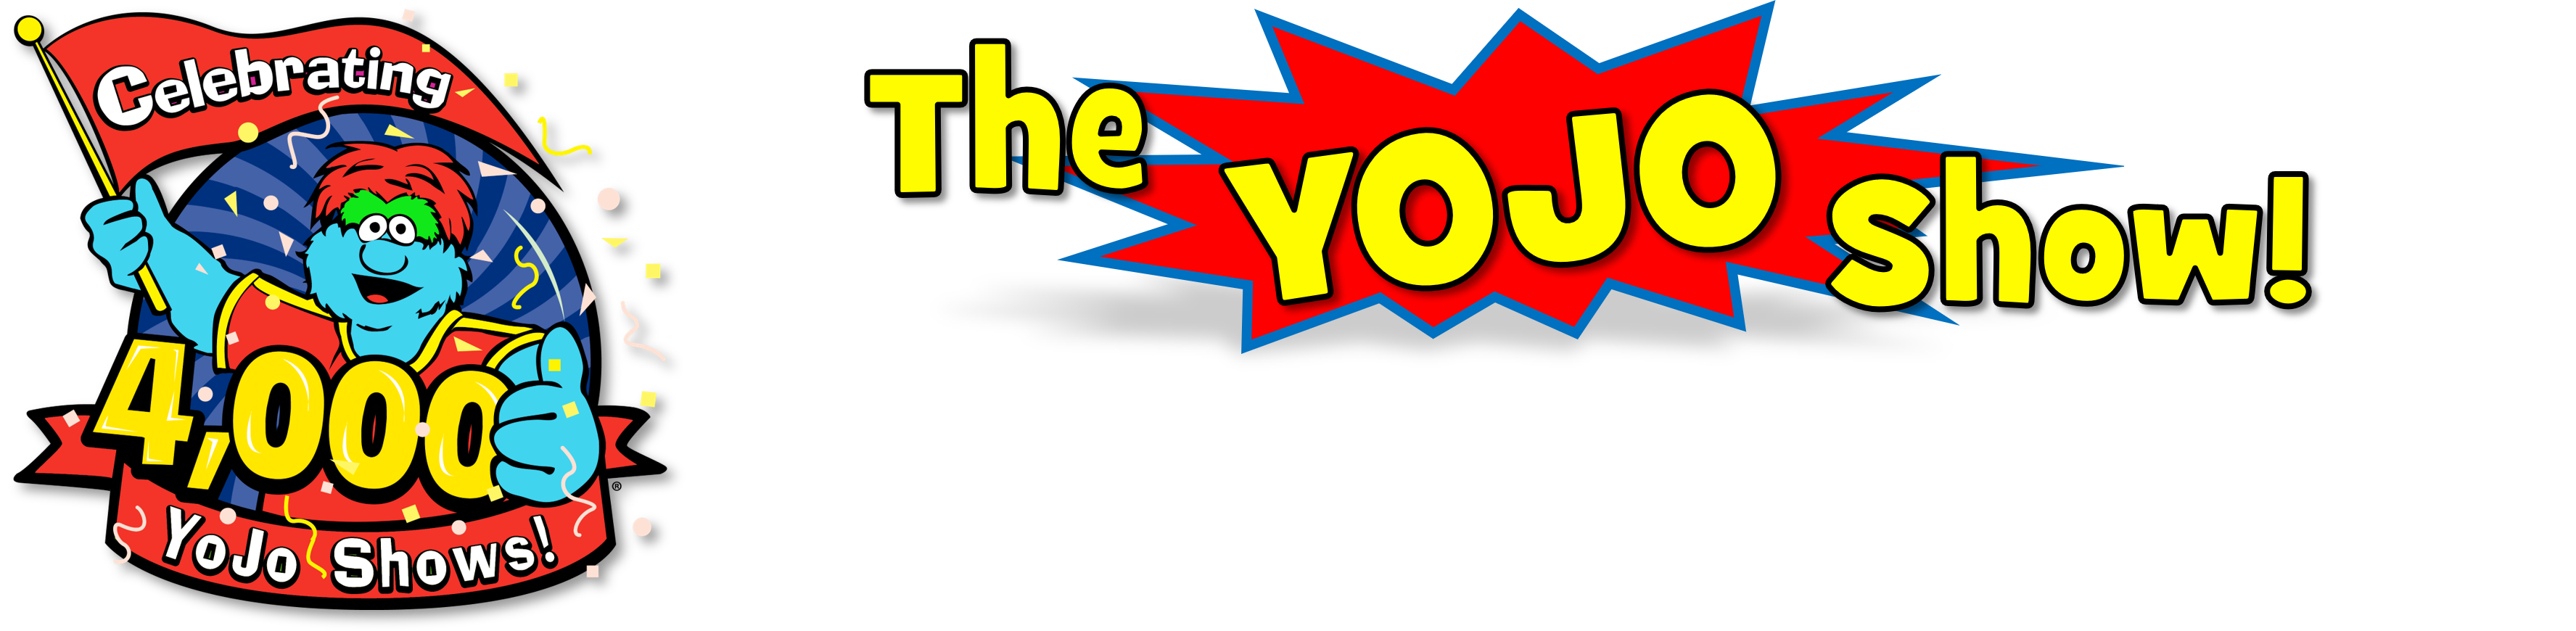 The YoJo Show